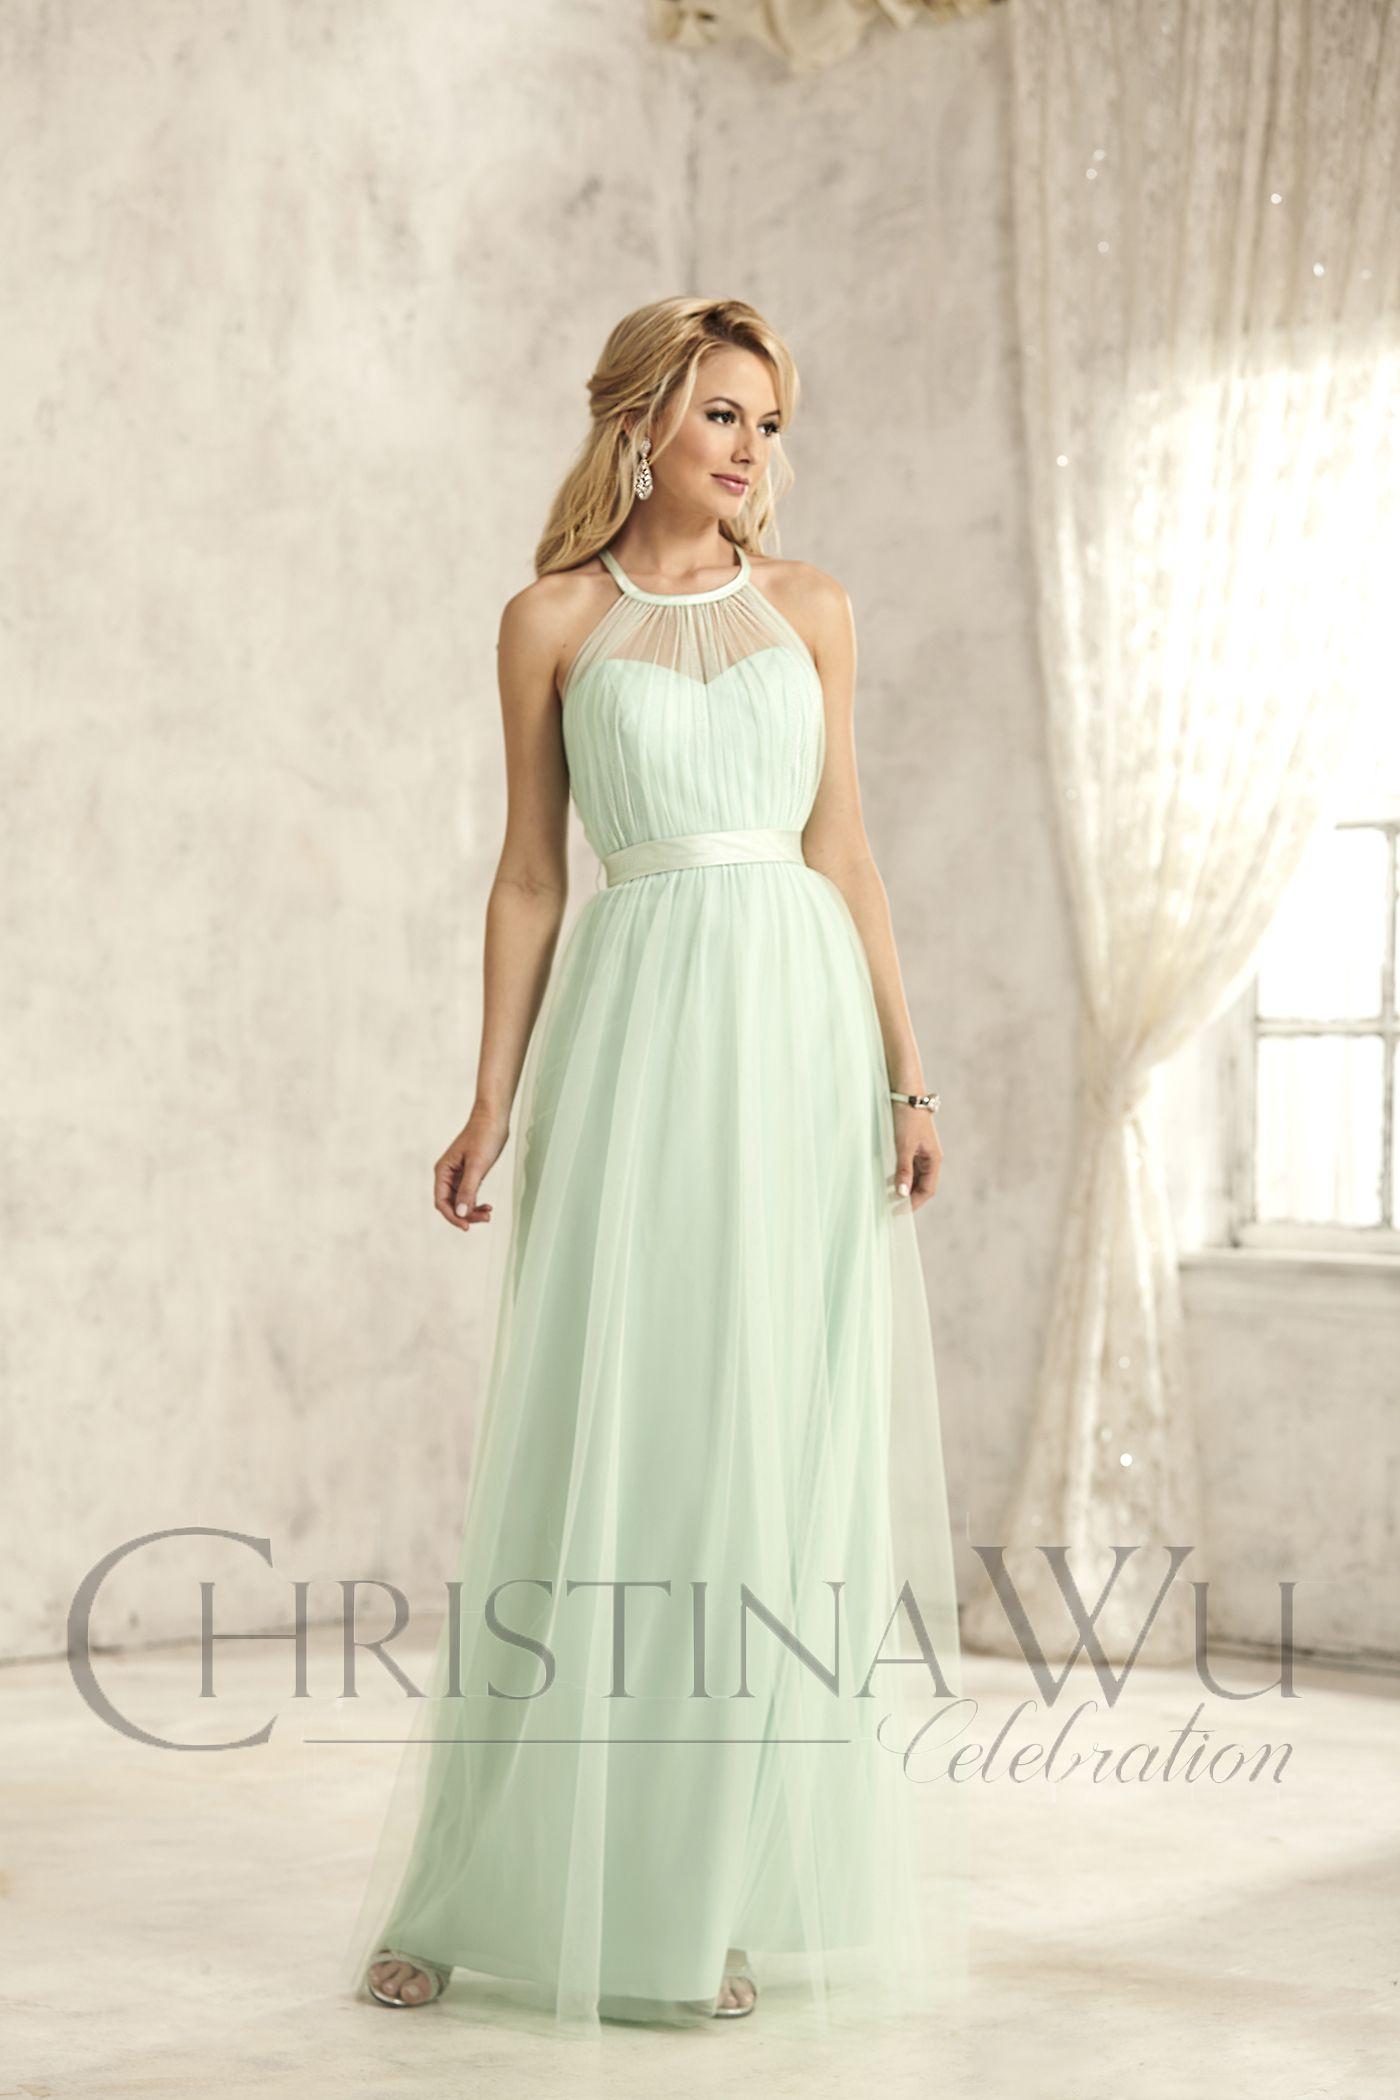 Christina wu wedding dresses  christinawu eternity bridesmaid maidofhonour eternity sparkle